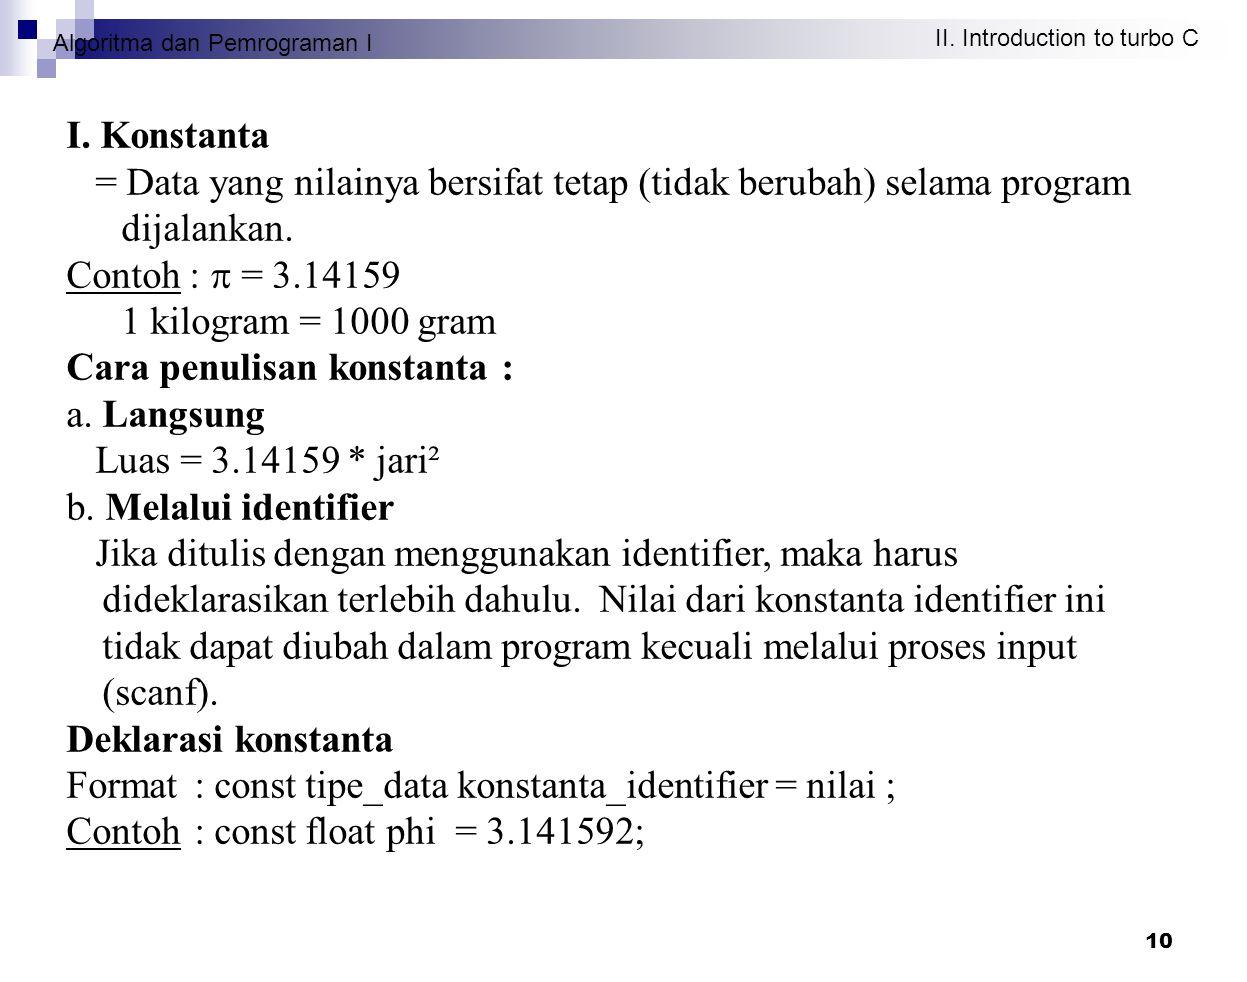 Algoritma dan Pemrograman I II. Introduction to turbo C 10 I. Konstanta = Data yang nilainya bersifat tetap (tidak berubah) selama program dijalankan.